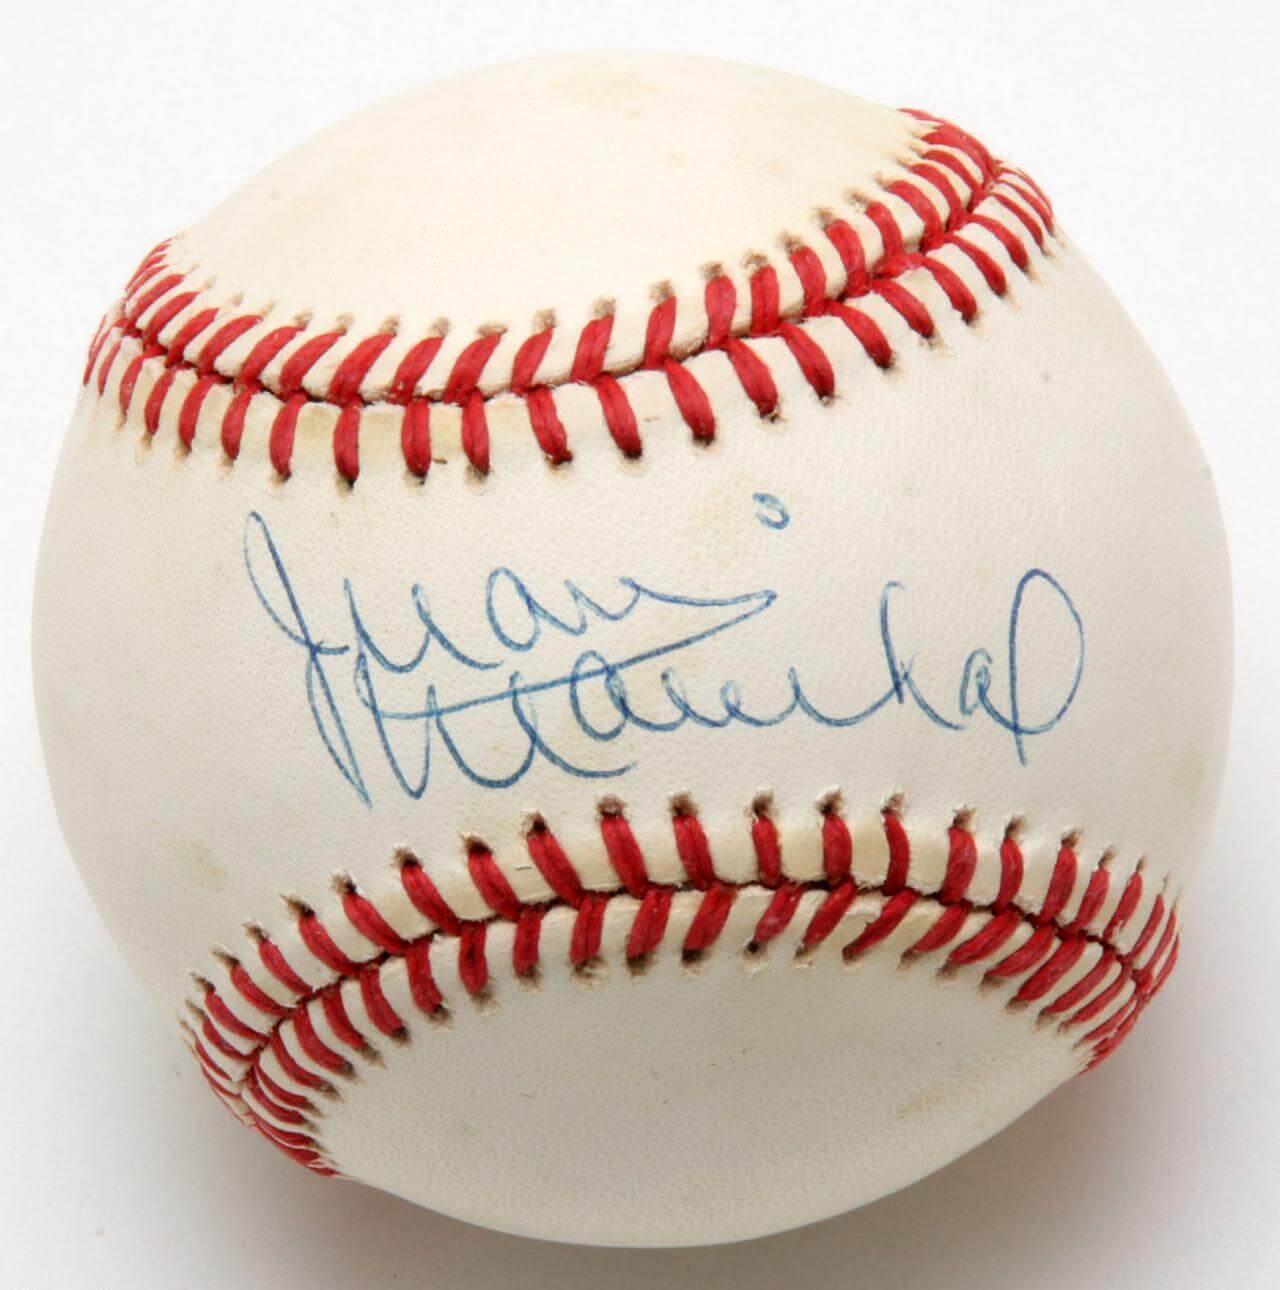 Juan Marichal Signed Baseball Giants - COA